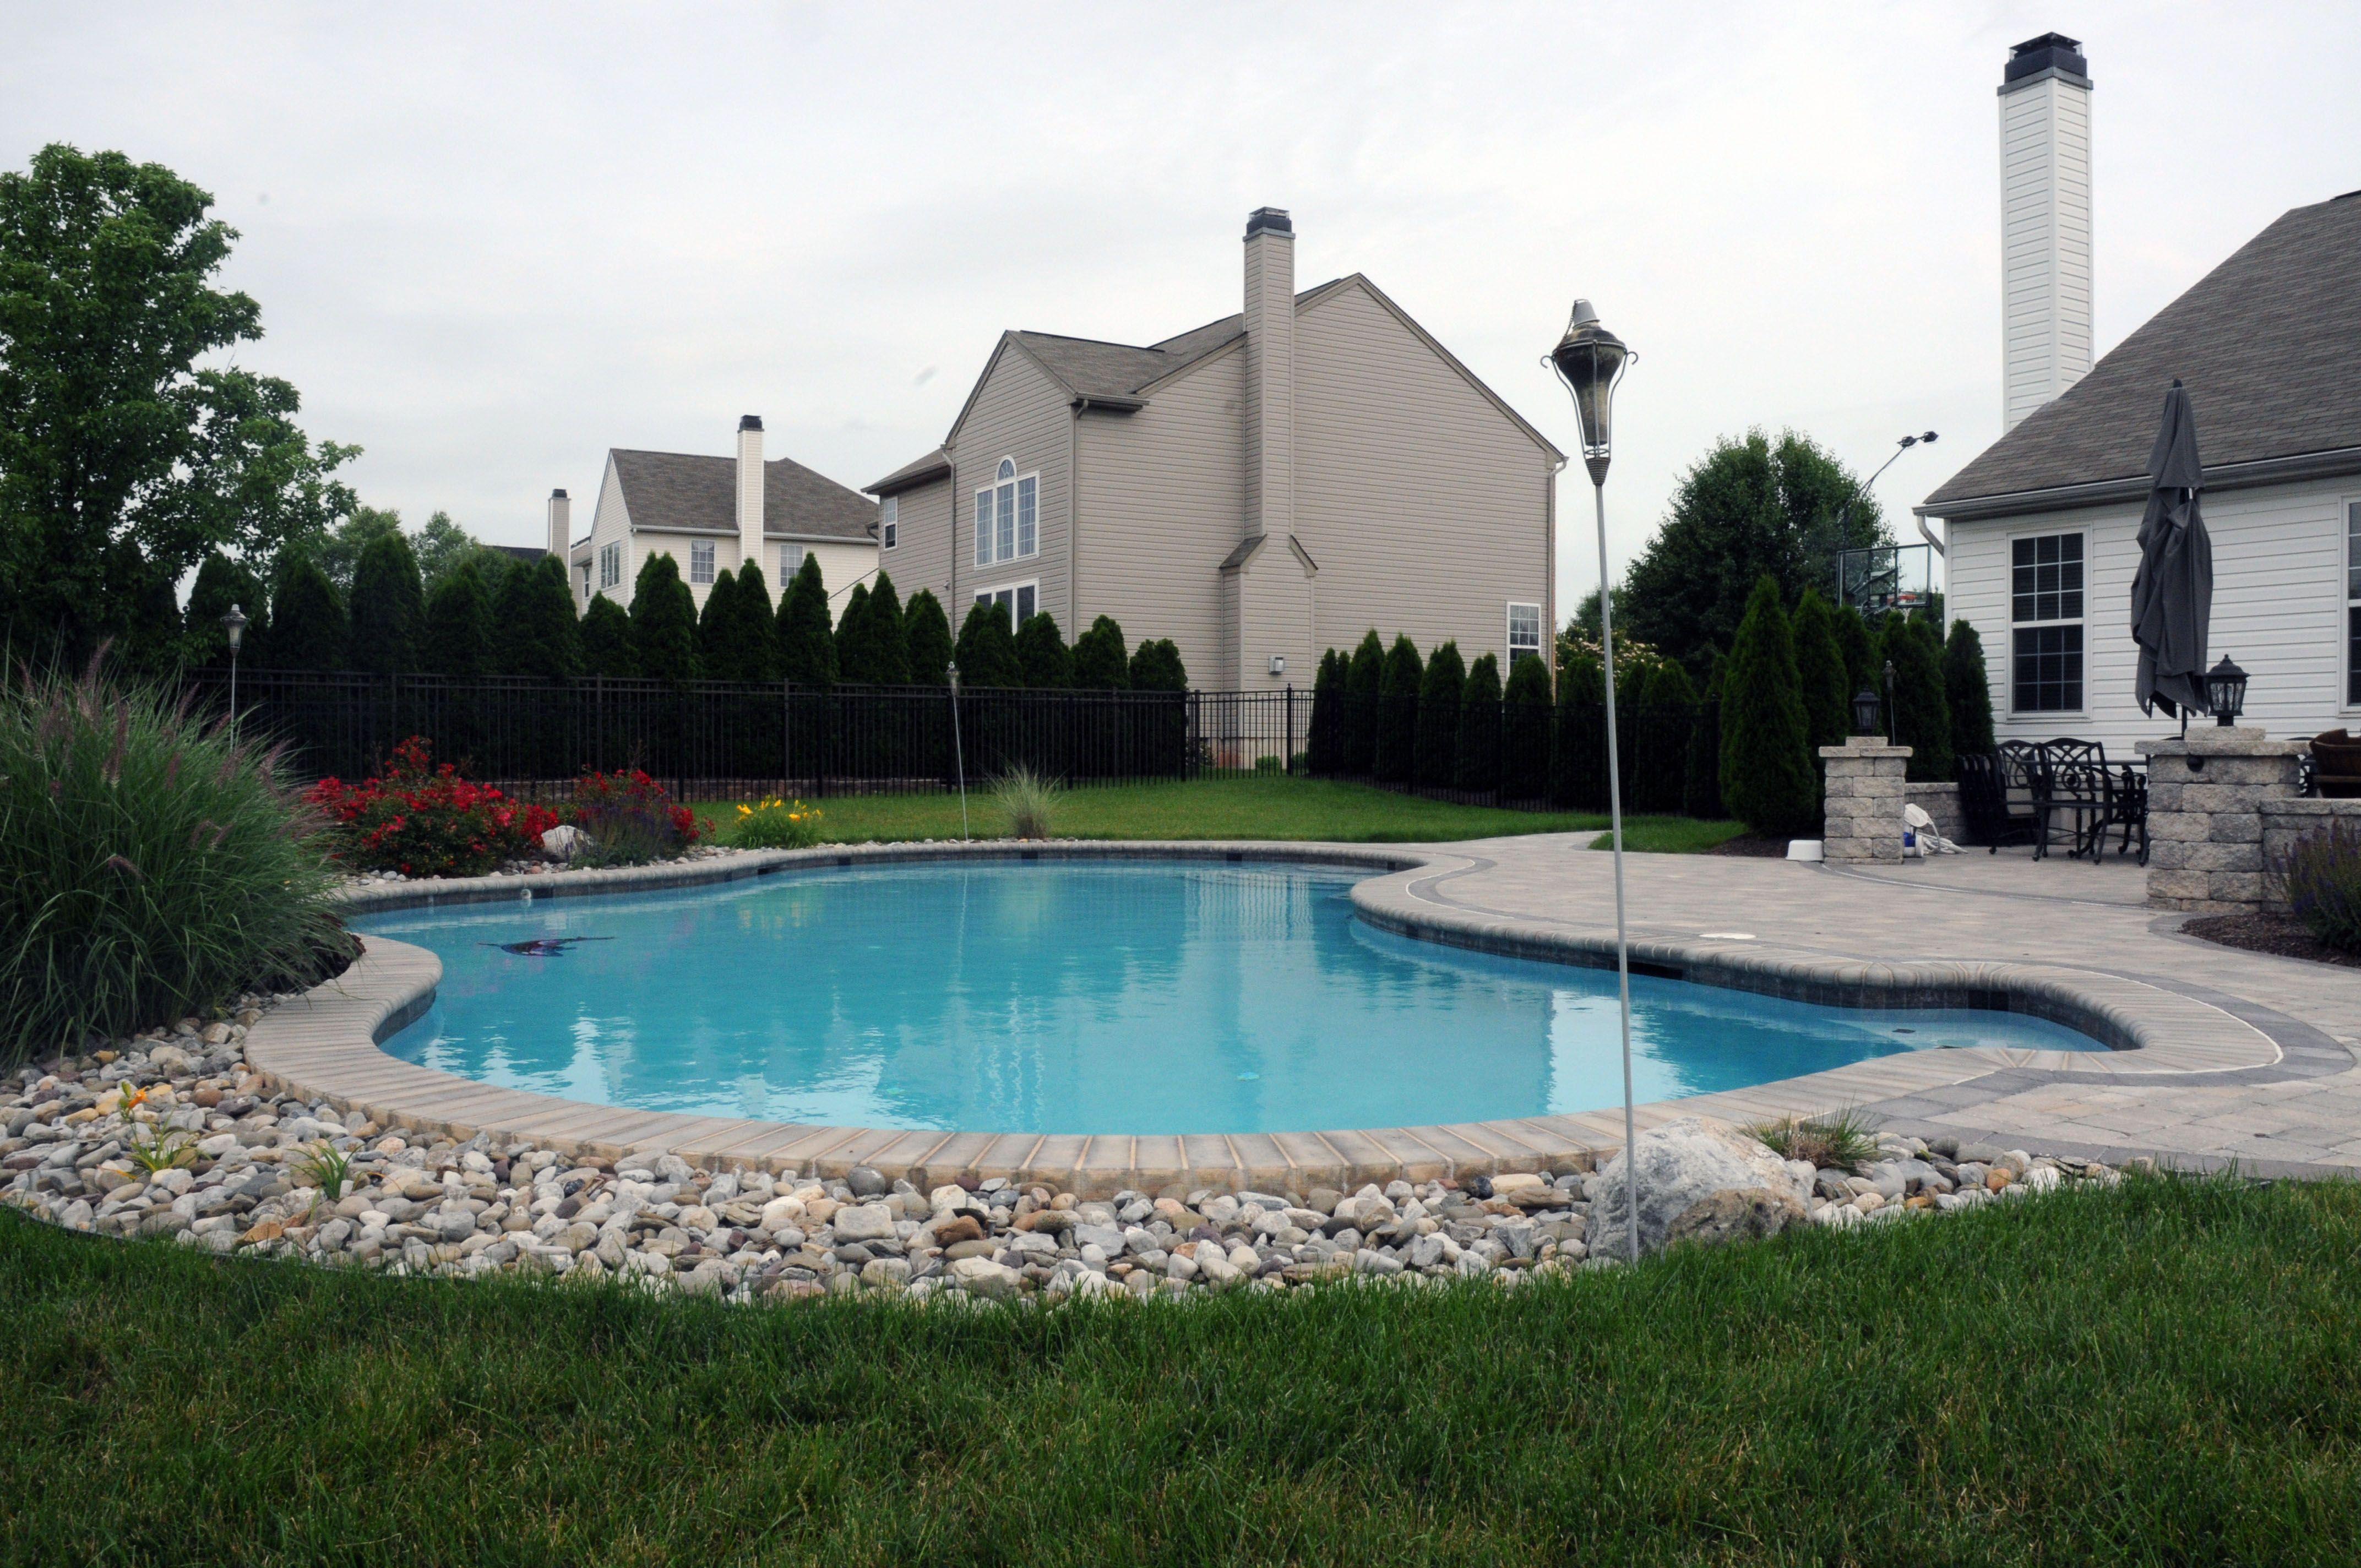 Gallery Inground Swimming Pools Landscaping Around Pool